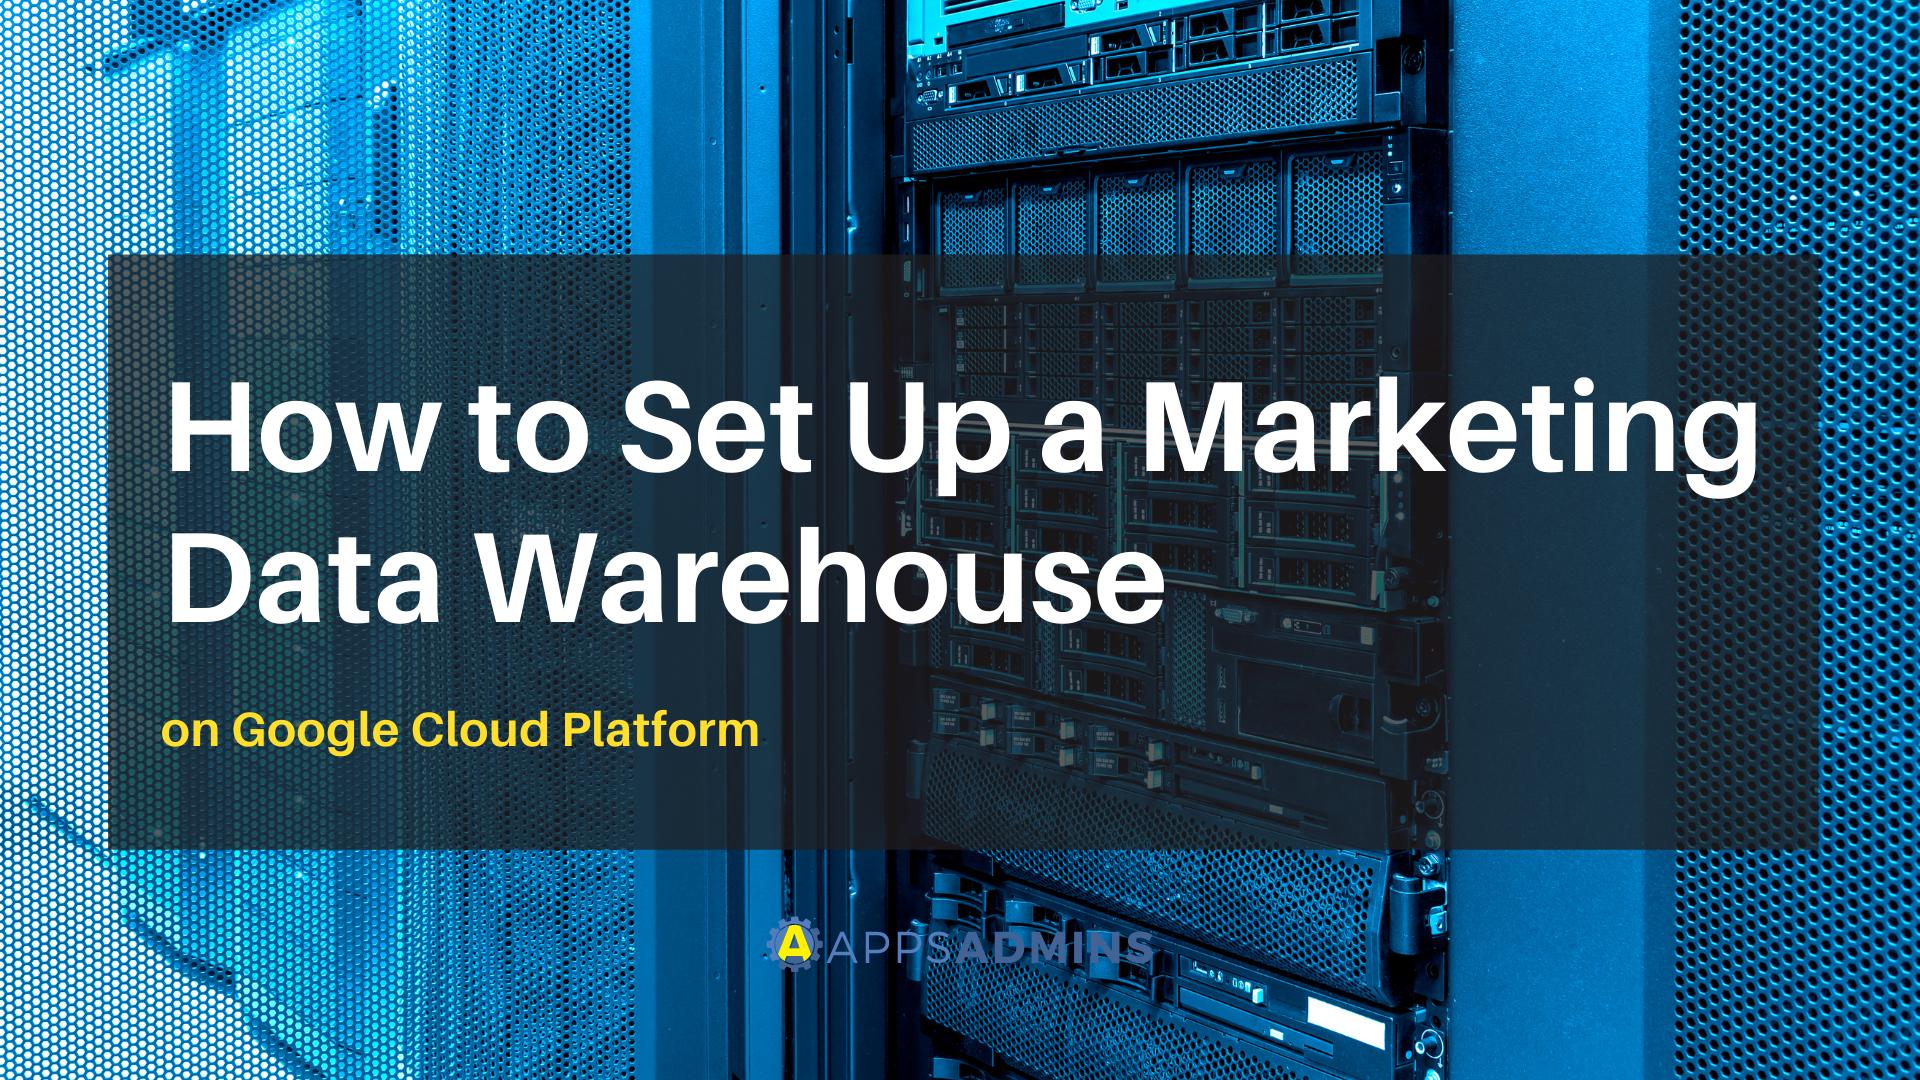 How to Set Up a Marketing Data Warehouse on Google Cloud Platform